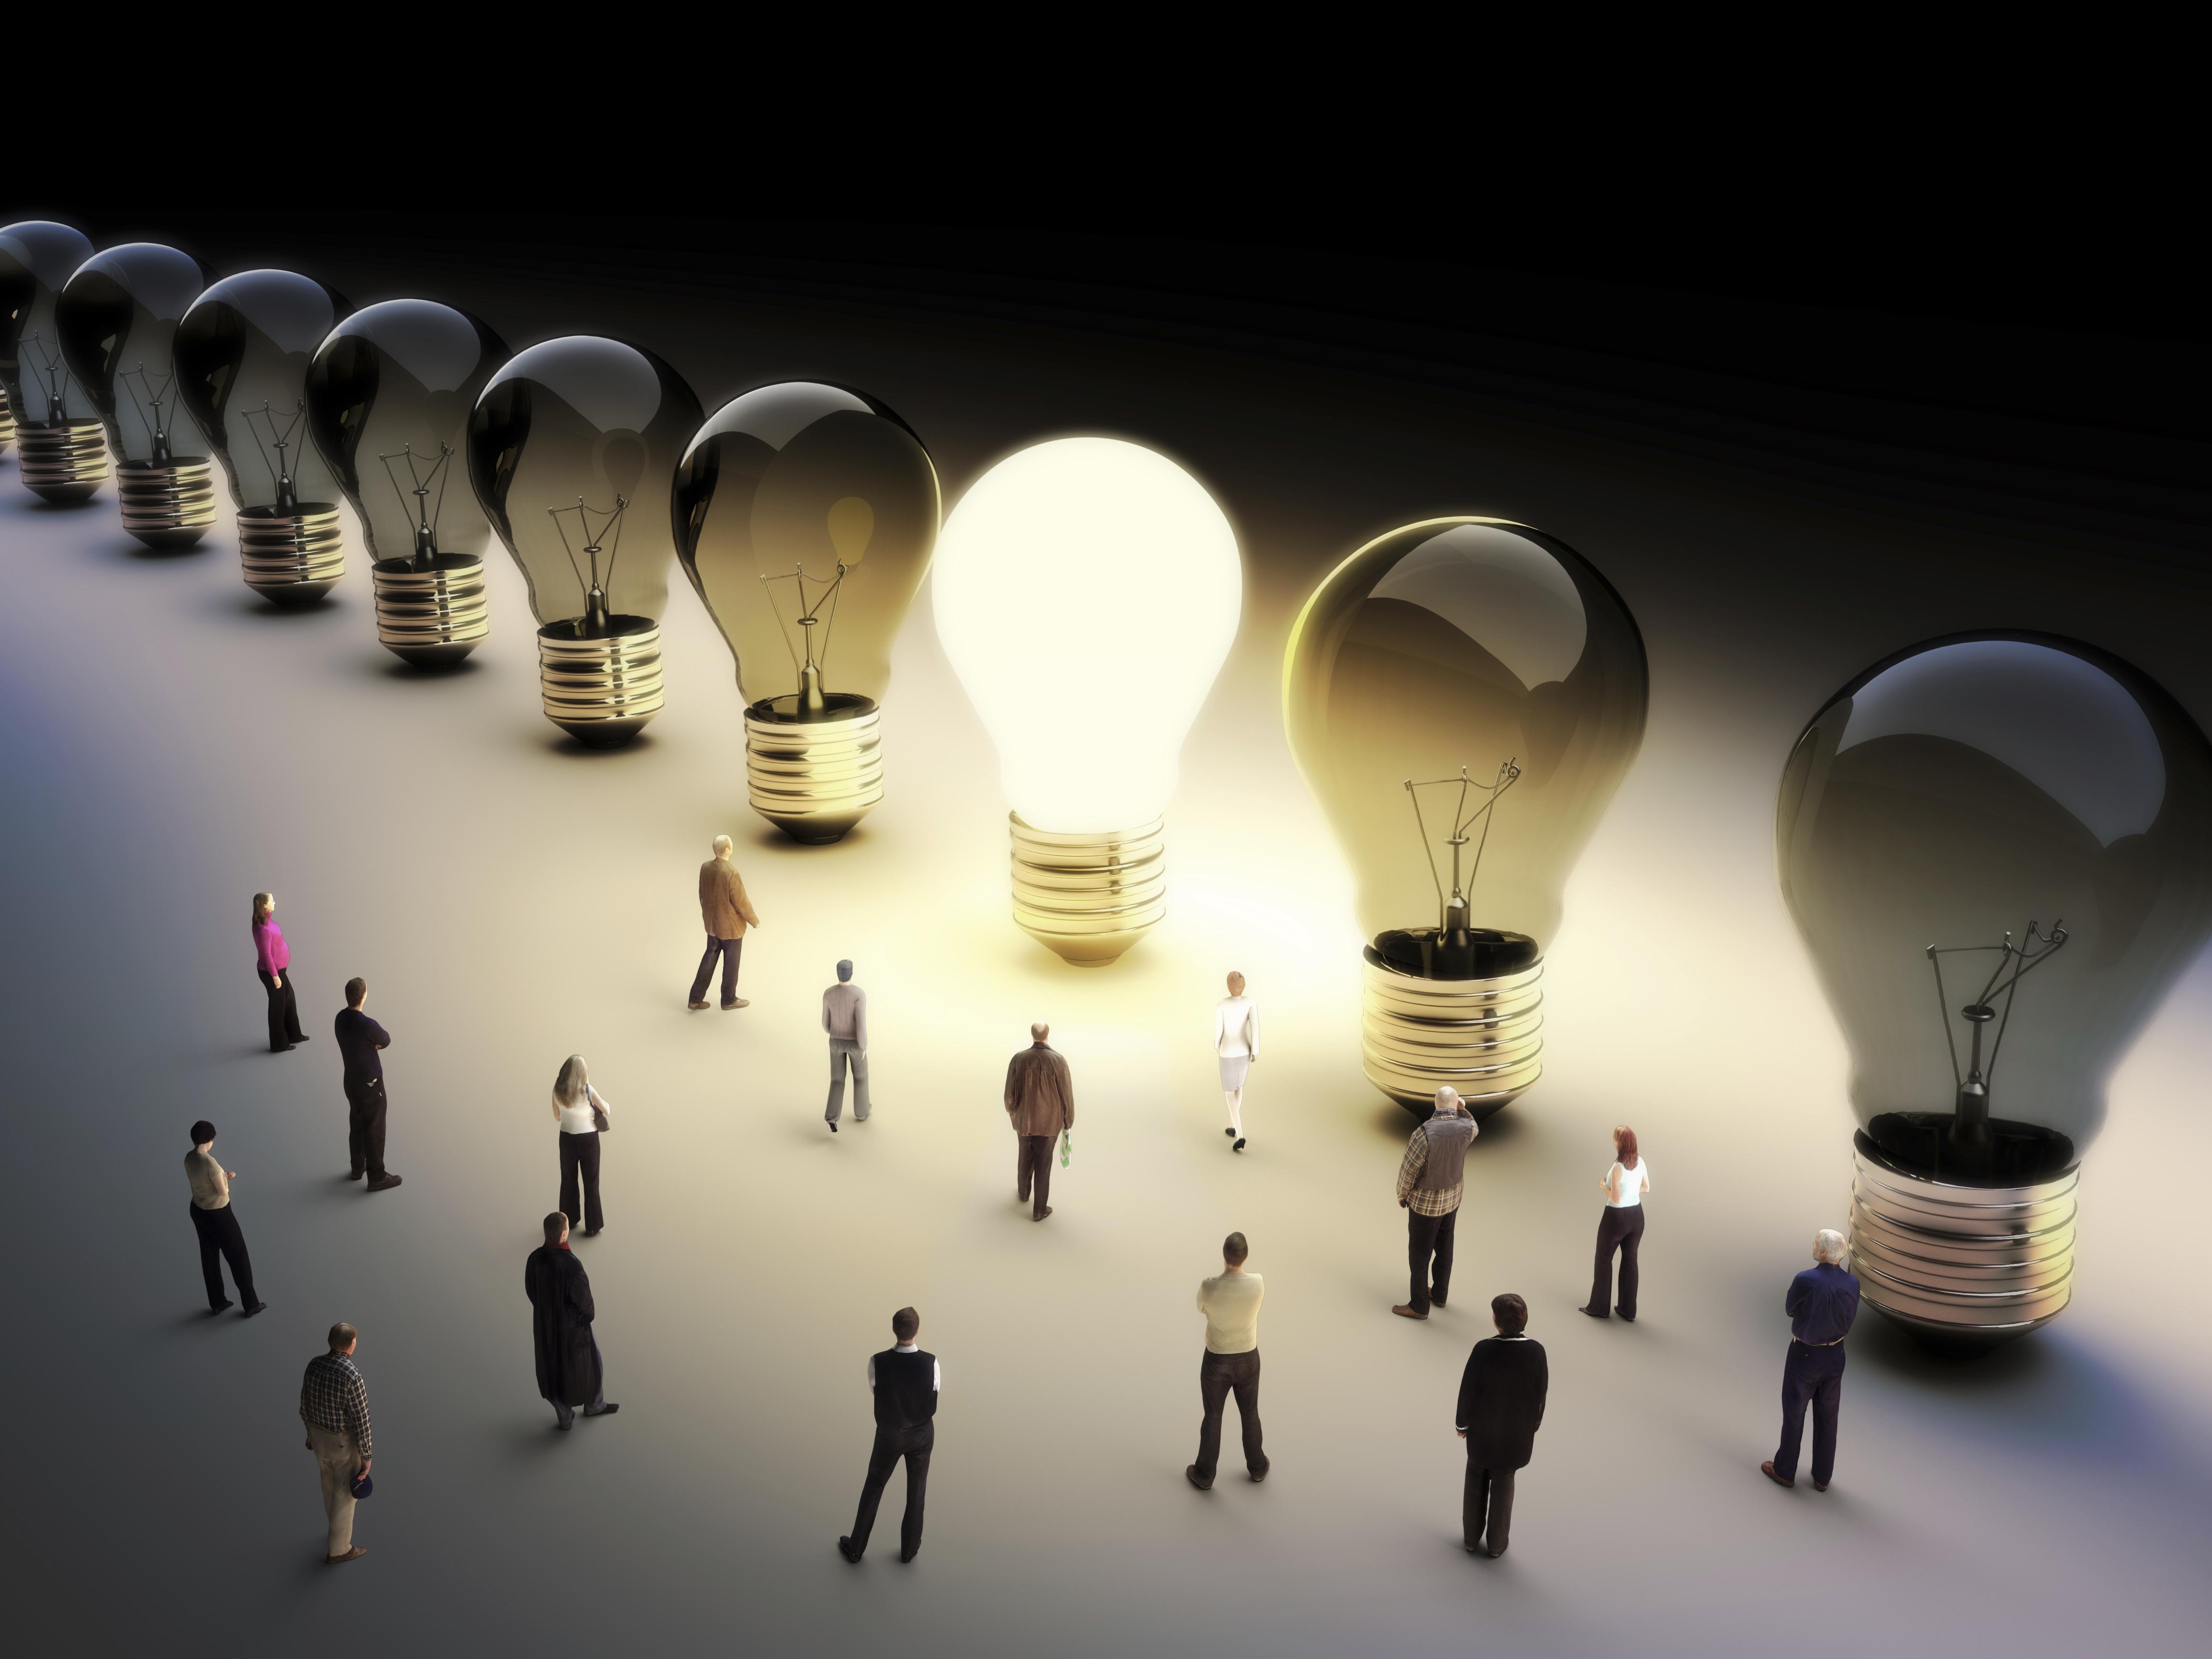 RPO, Recruitment Process Outsourcing